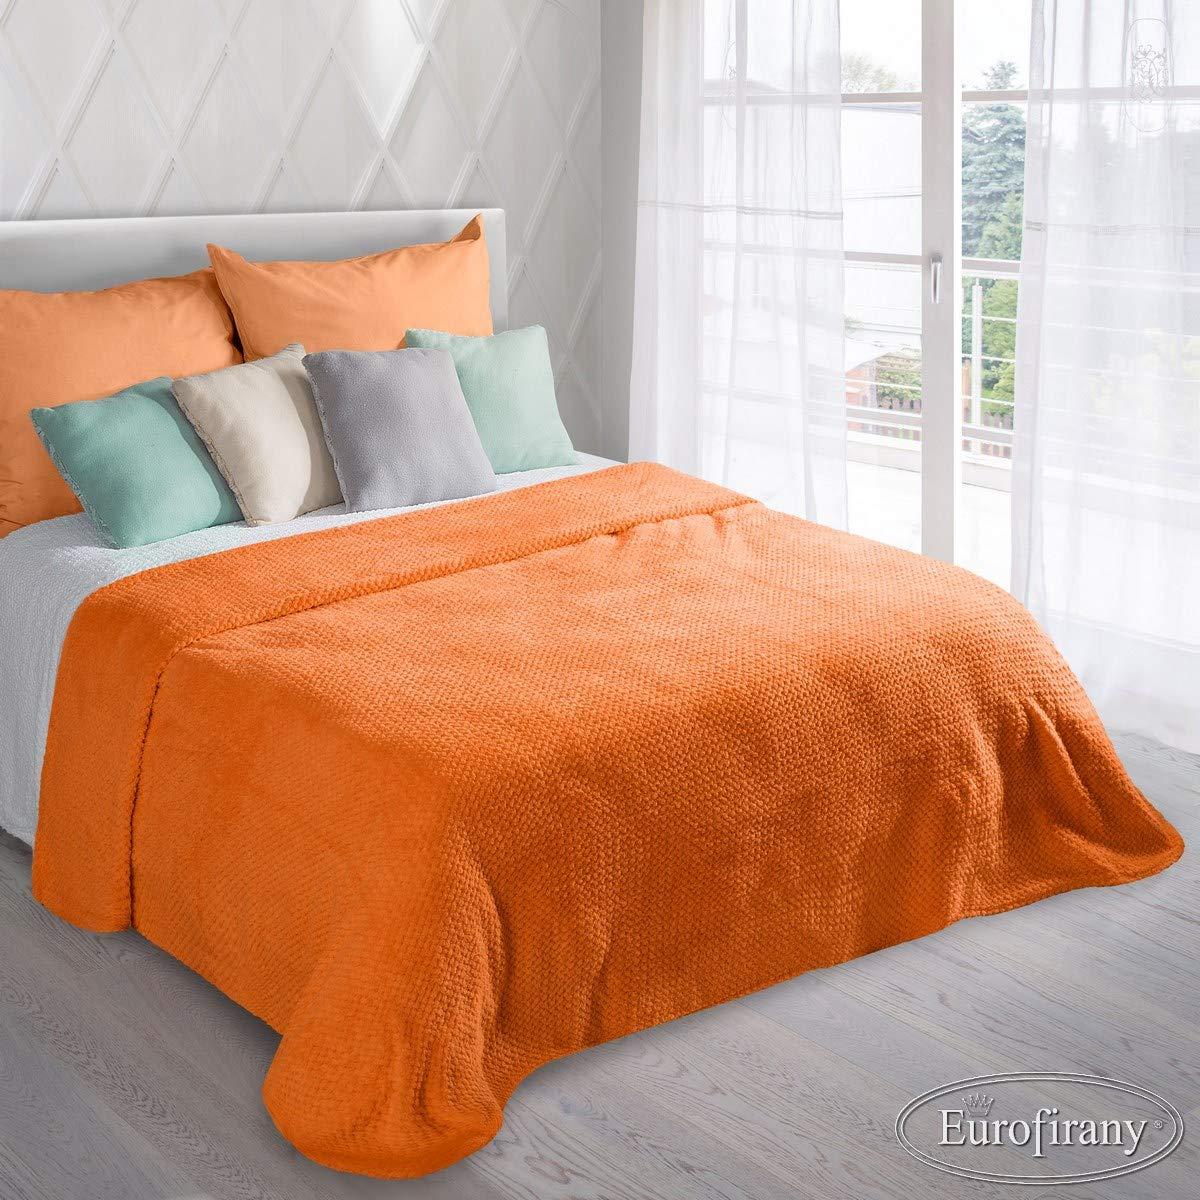 Couvre-lit Ricky Orange Orange 220/x 240/cm microfibre